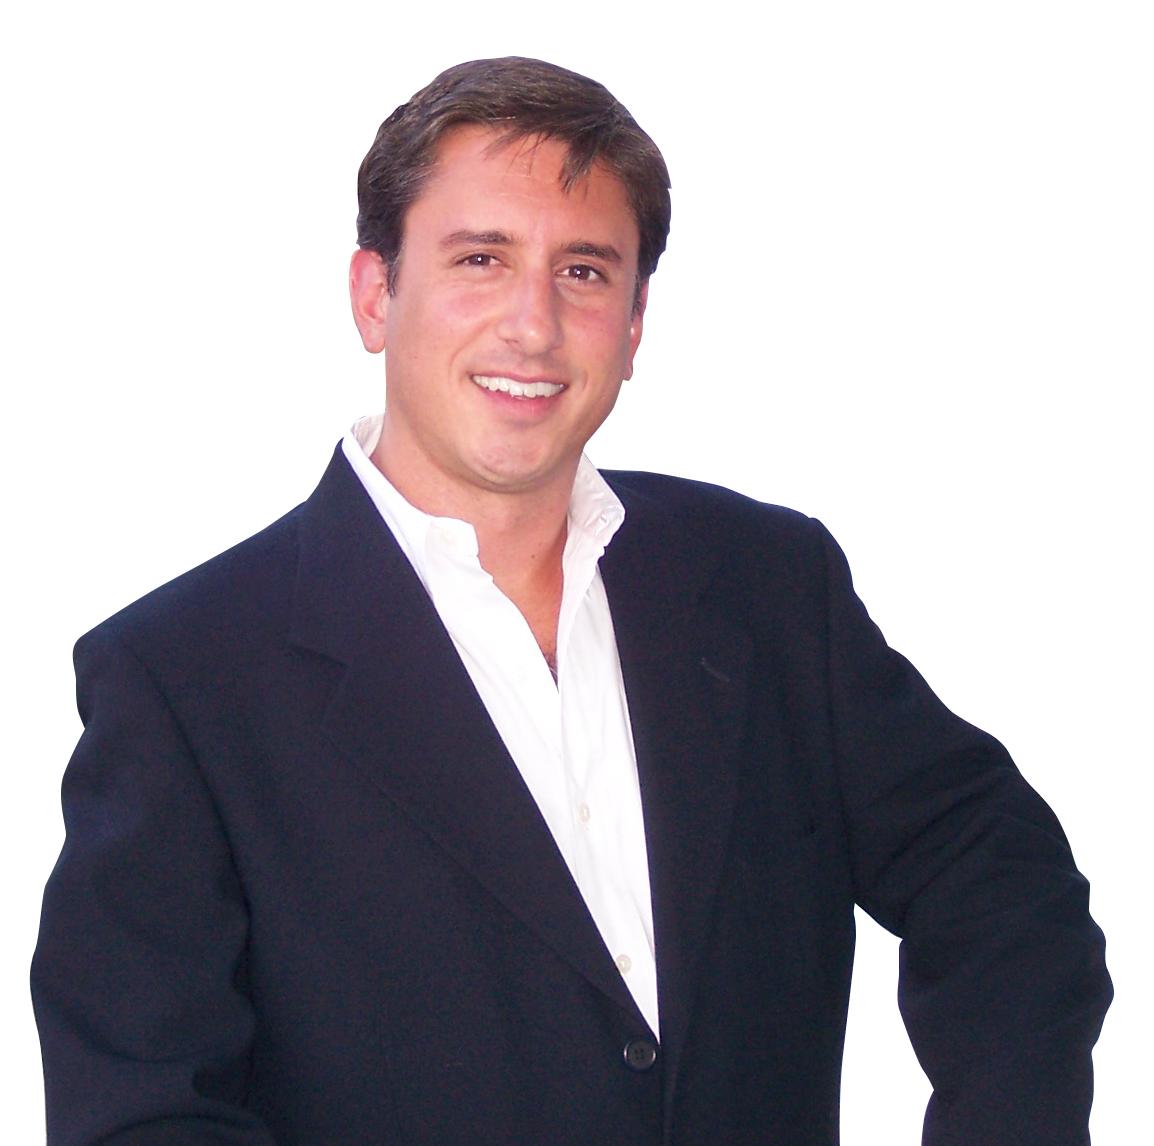 Brian Hero